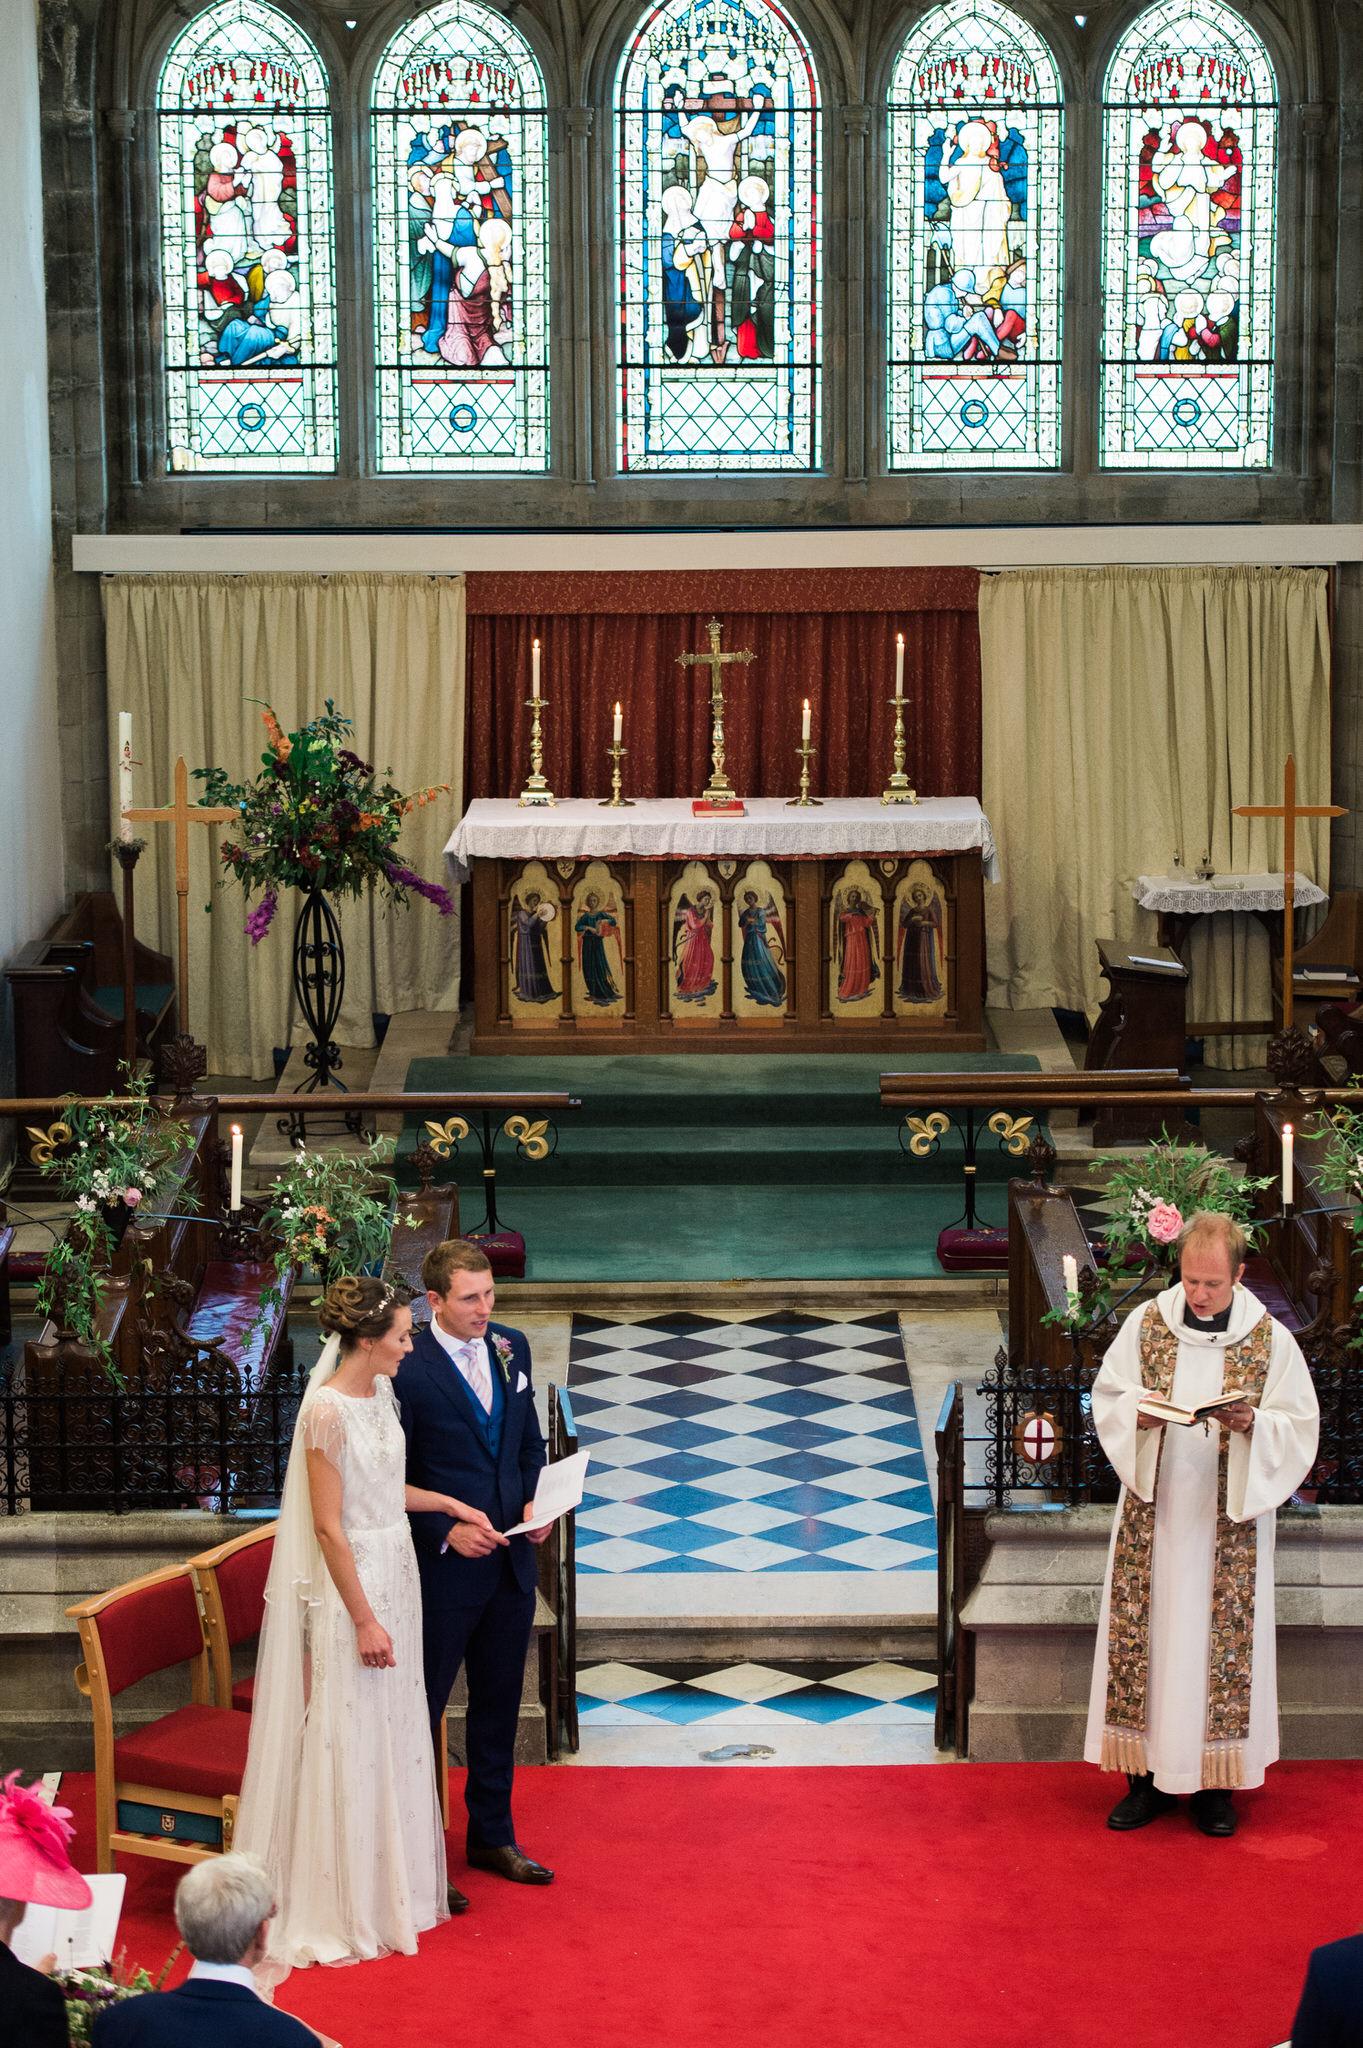 Salcombe devon marquee wedding by simon biffen photography 14